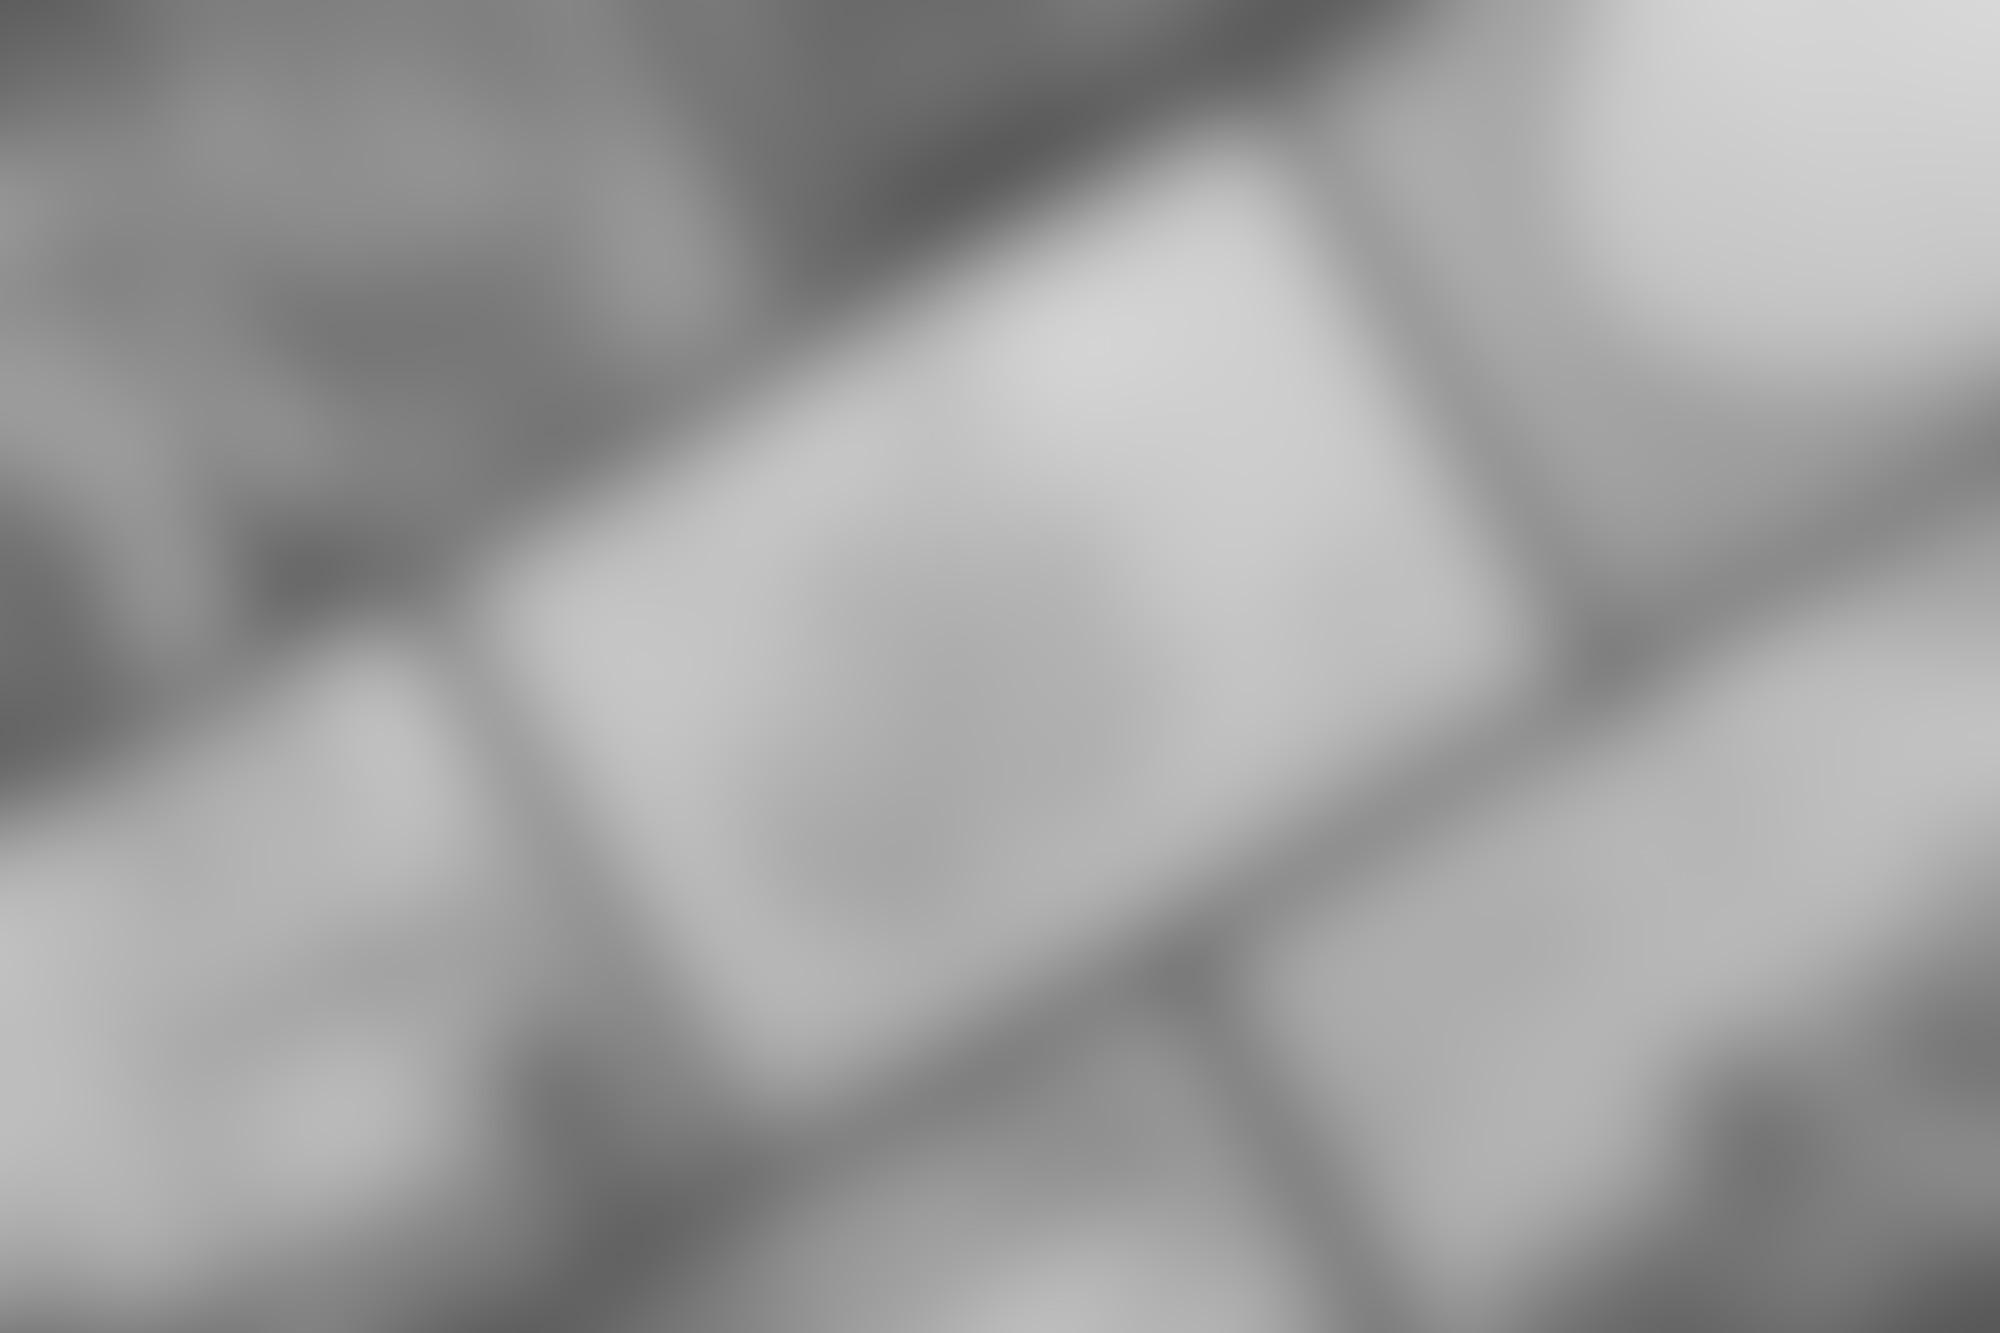 Tvc print 03 autocompressfitresizeixlibphp 1 1 0max h2000max w3 D2000q80sda0f9bffec83a89df25c99e66d417d74